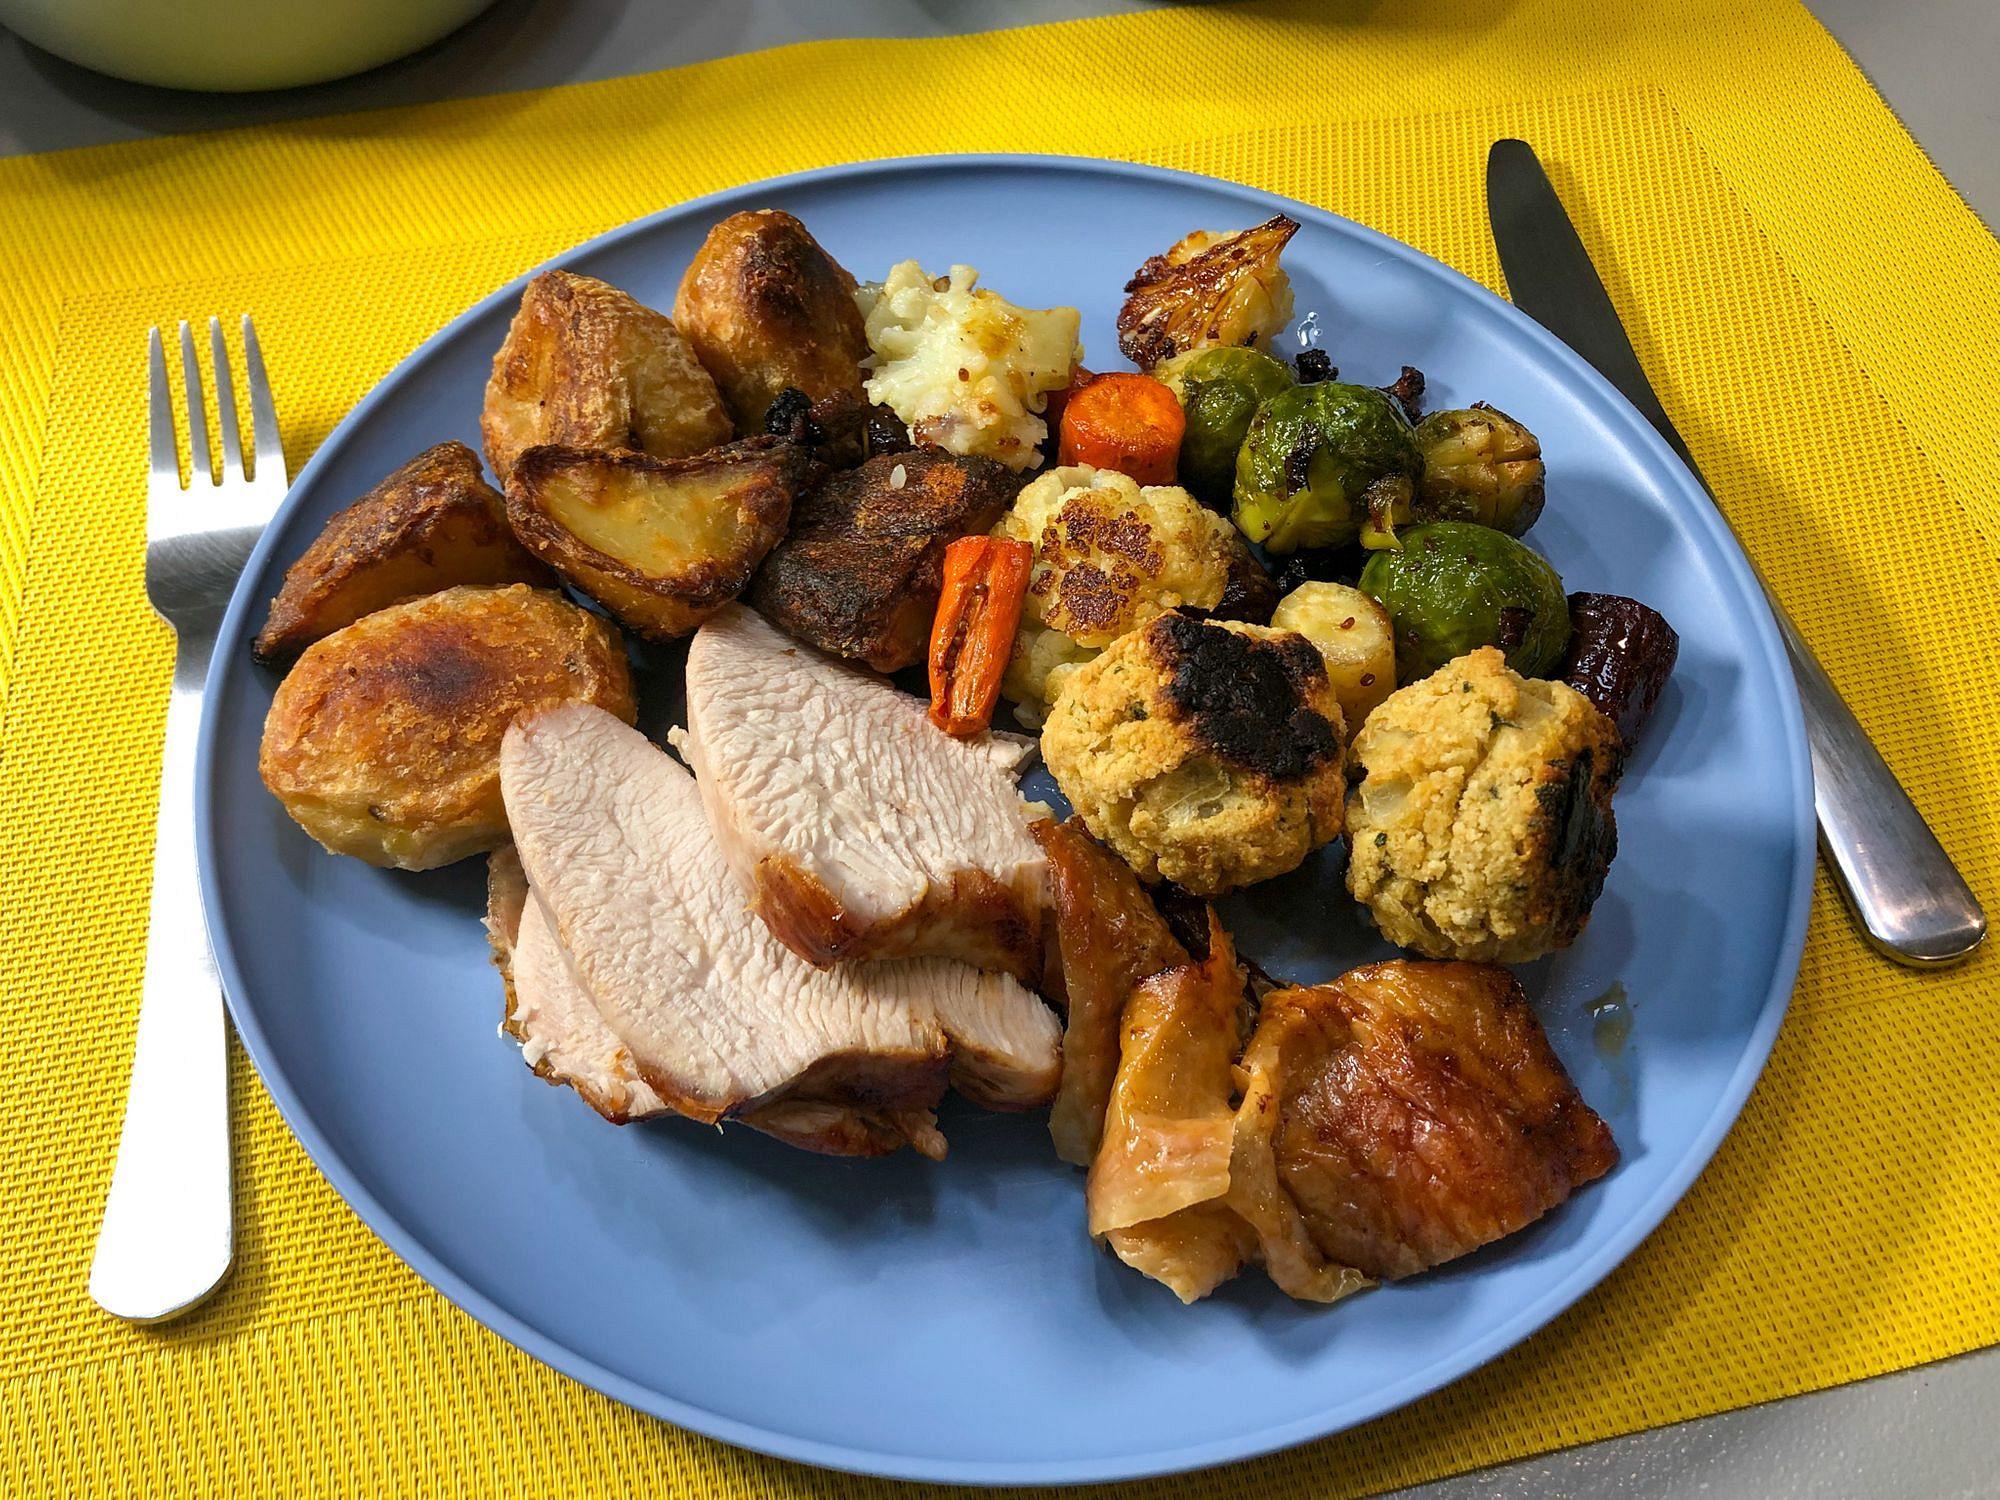 Roast Turkey Air Fryer